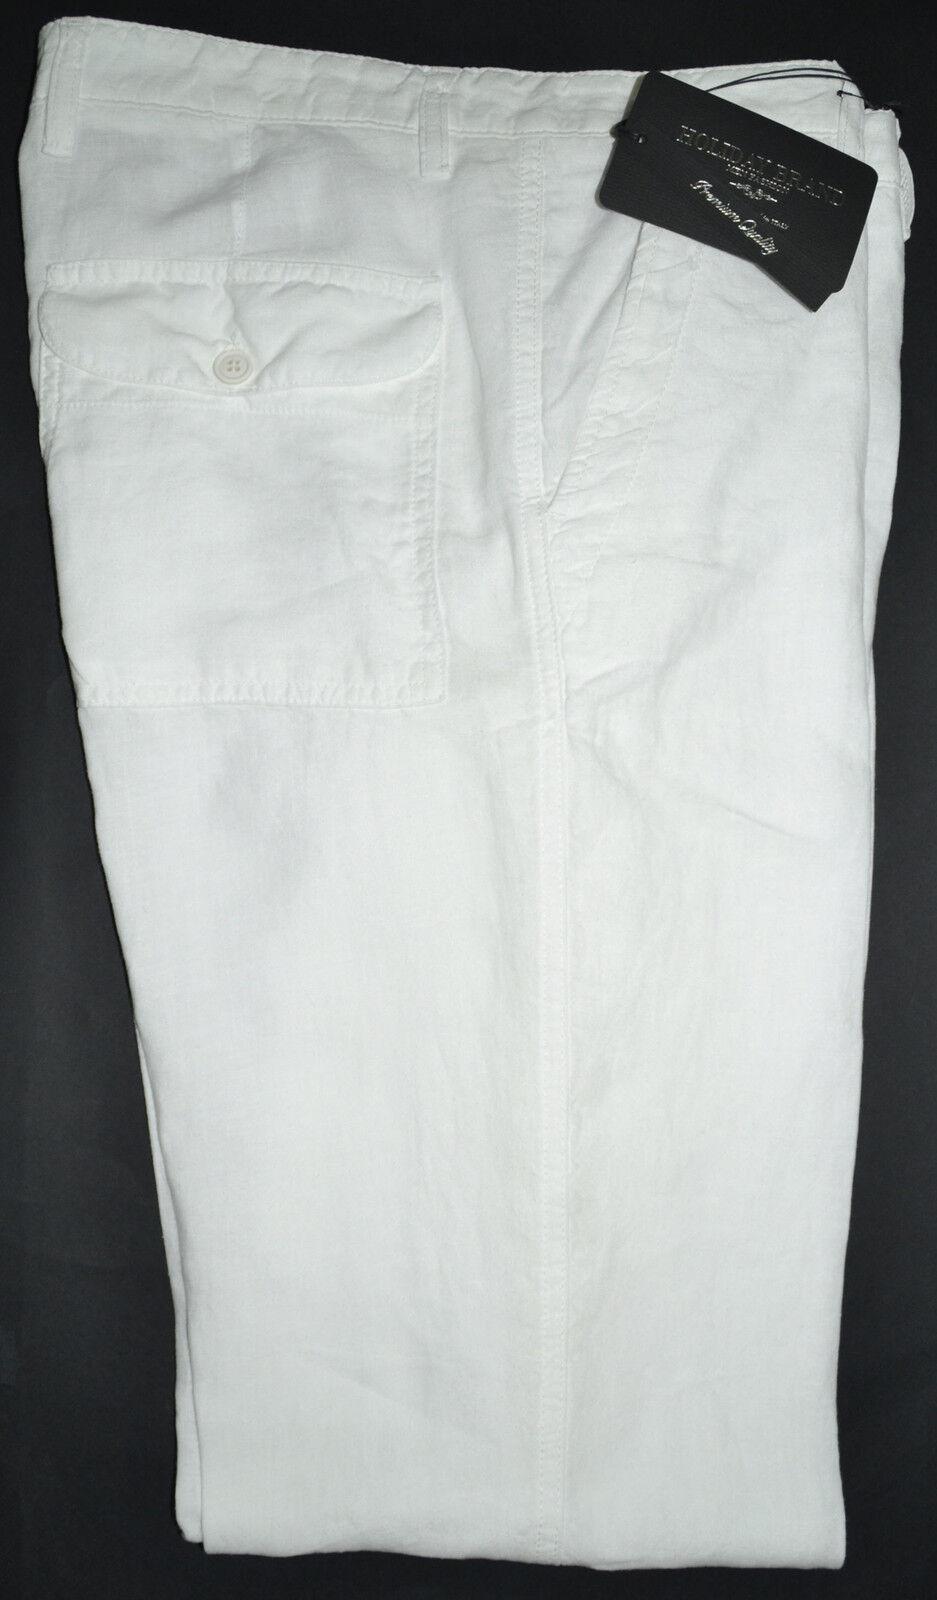 Pantalone moda uomo HOLIDAY taglia 46 48 50 52 52 52 54 lino 100% bianco 92eb26